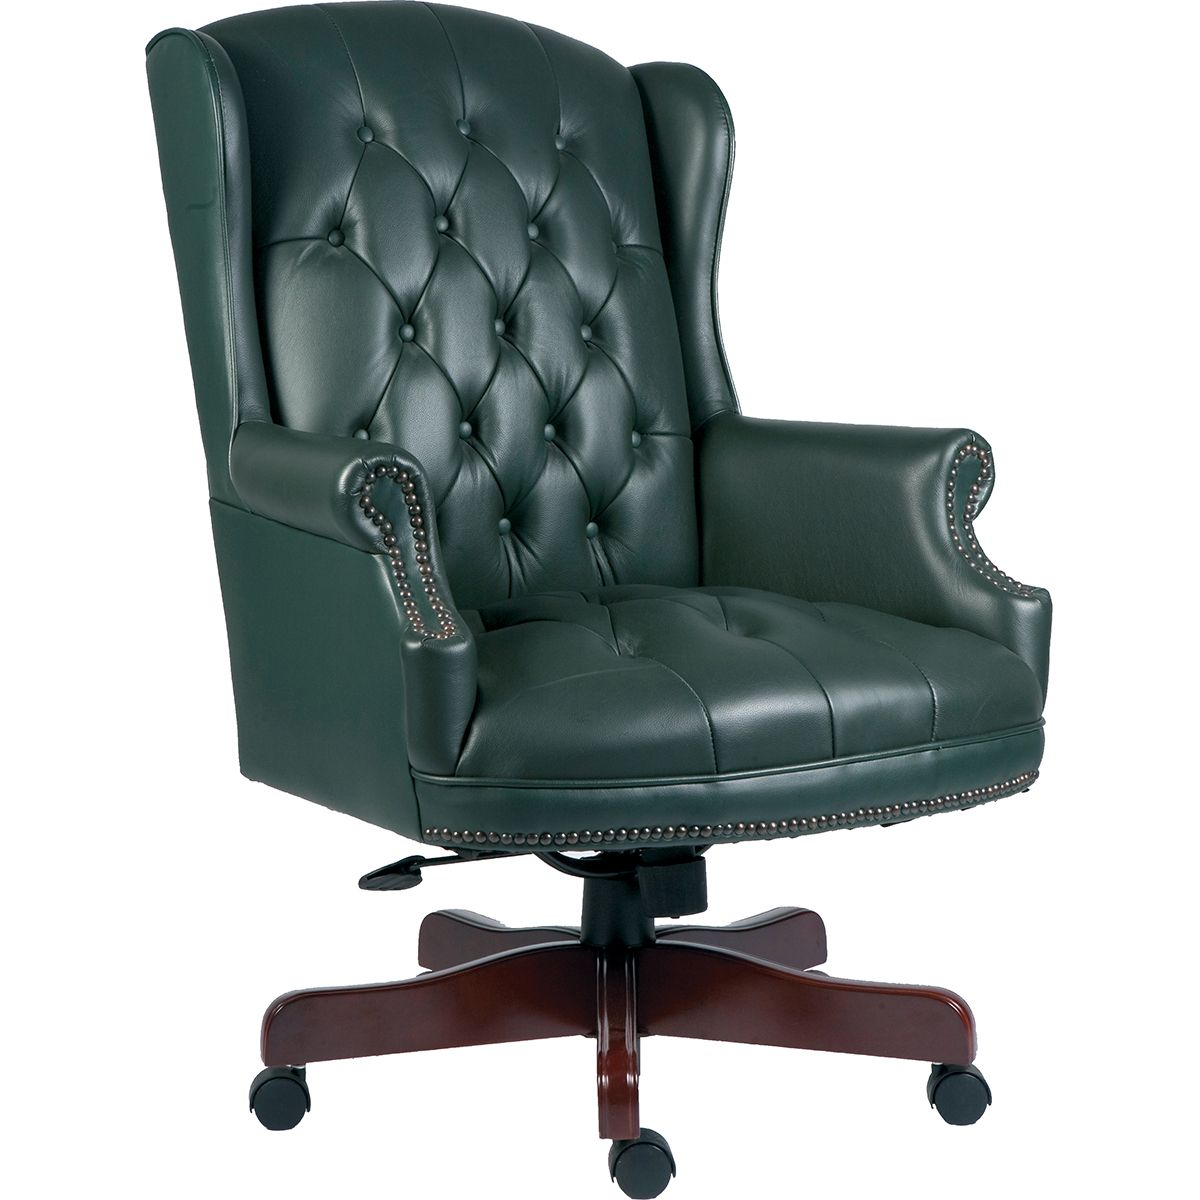 Park Art My WordPress Blog_Green Leather Chair And Ottoman